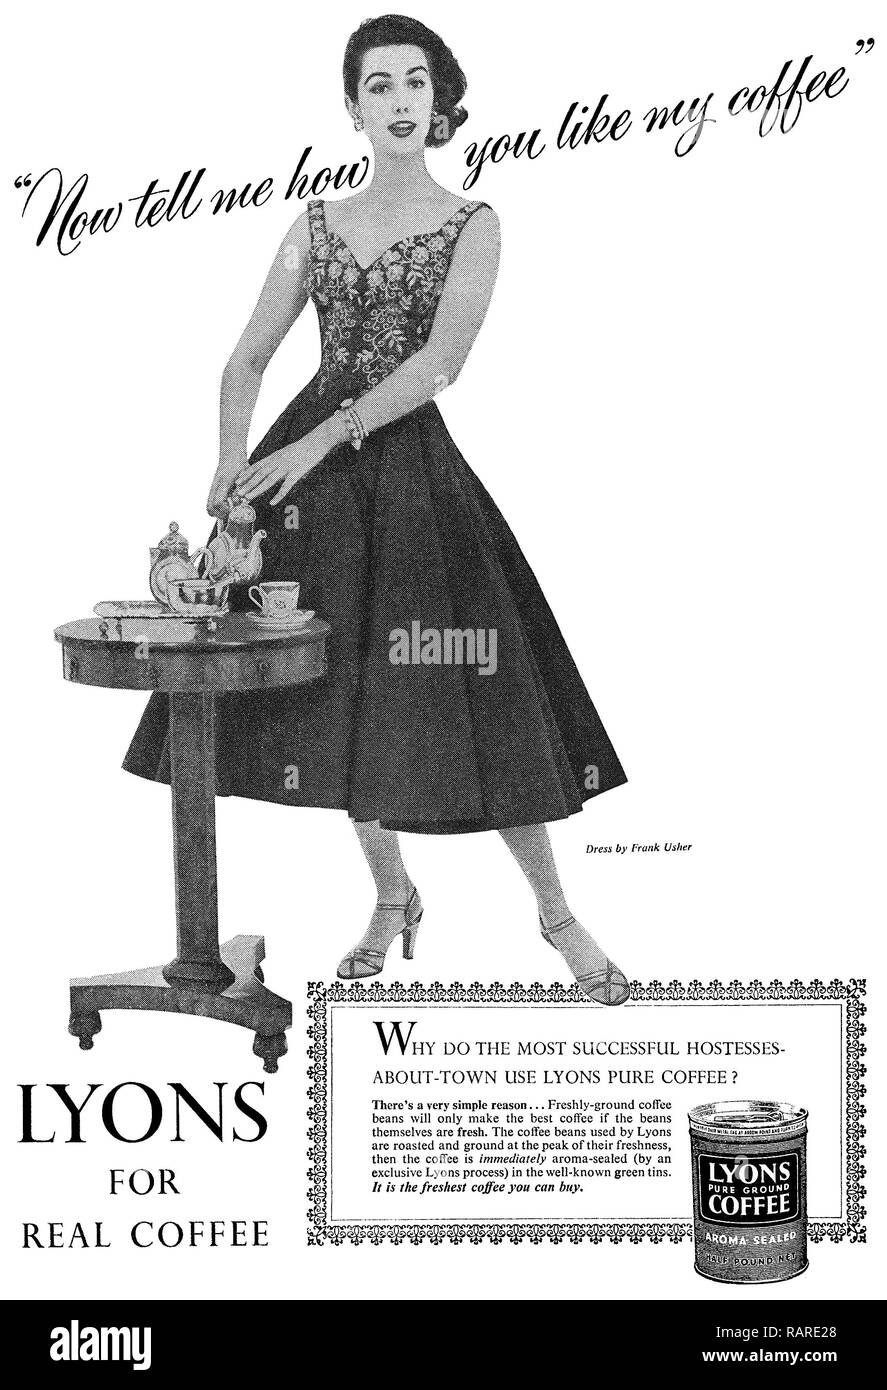 1956 British advertisement for Lyons ground coffee. - Stock Image